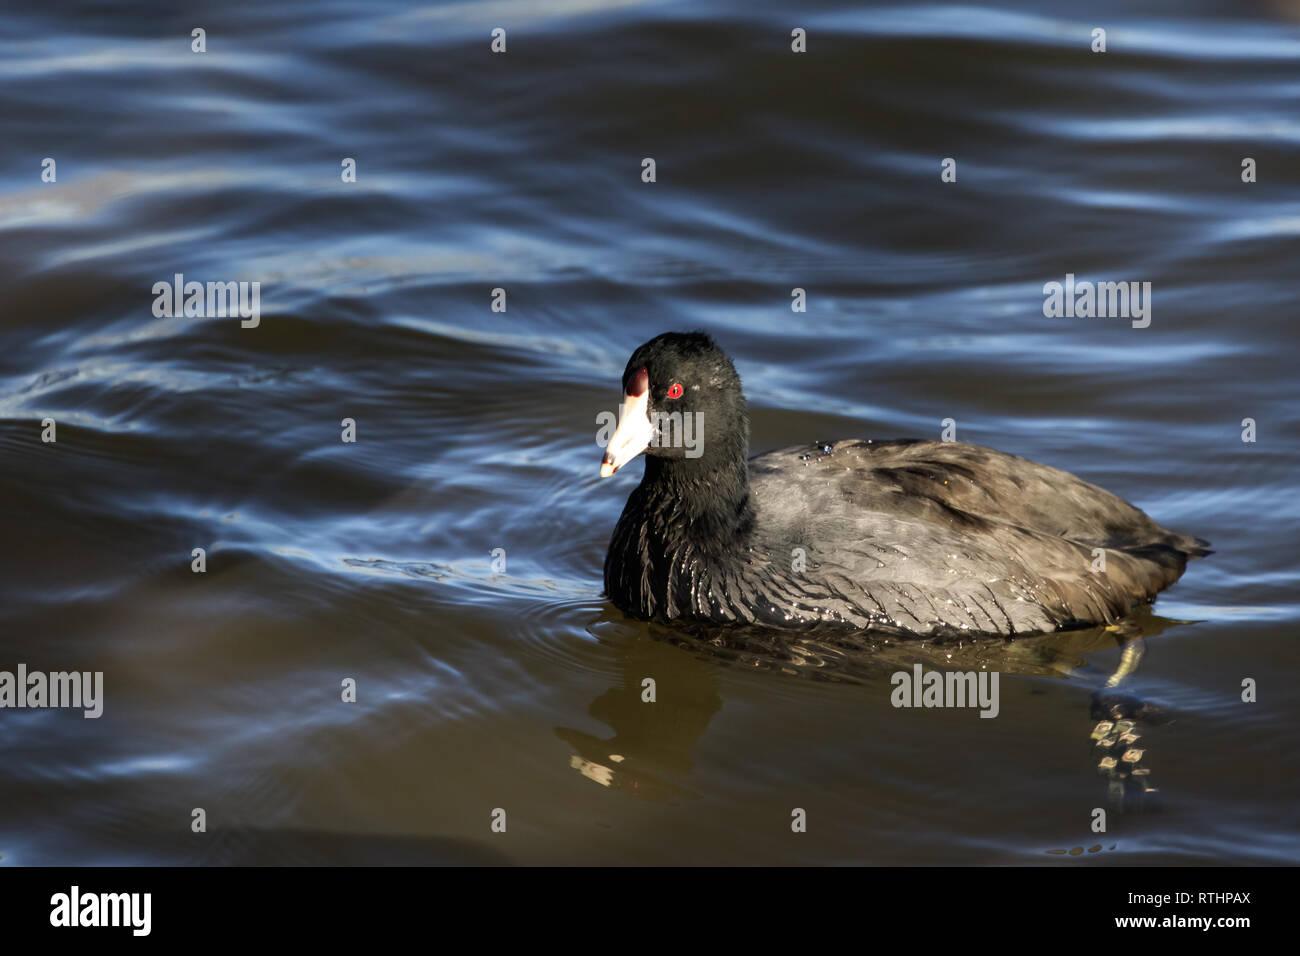 An American Coot (Fulica americana) swimming in a lake Stock Photo